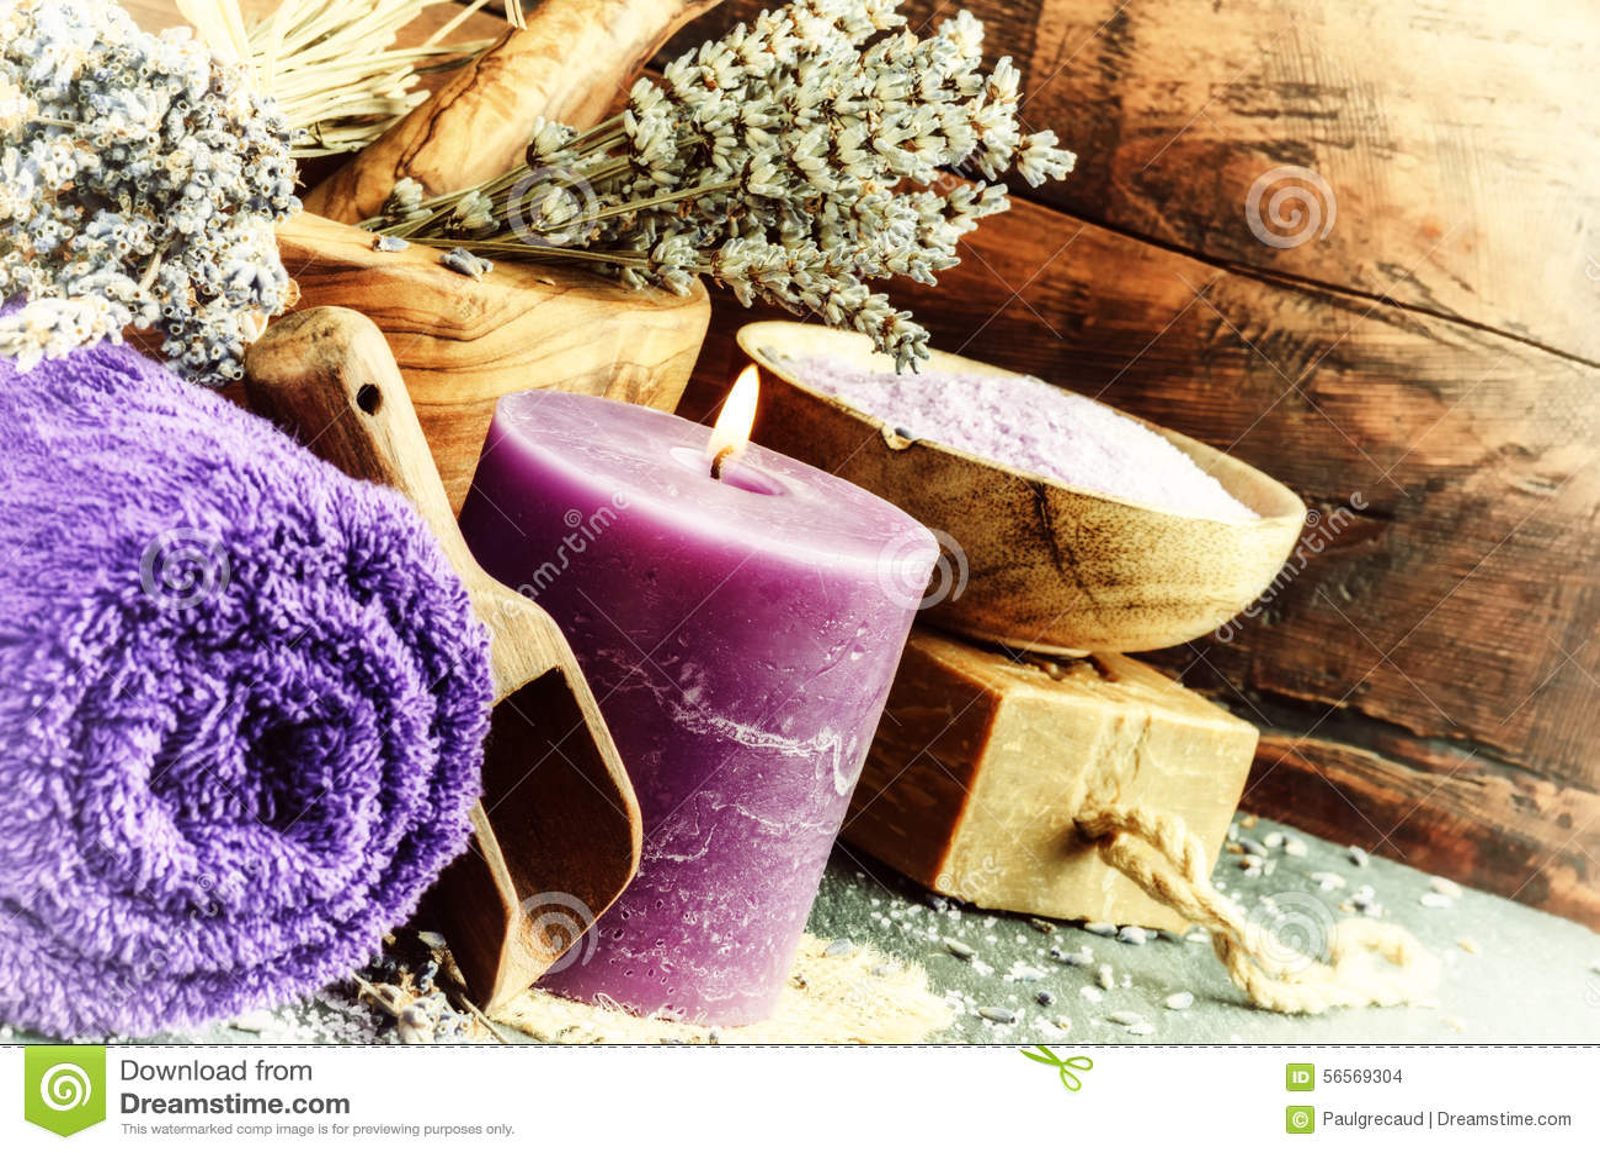 Download Lavender SPA τιμή τών παραμέτρων Φυσική έννοια Wellness Στοκ Εικόνες - εικόνα από οργανικός, lavender: 56569304